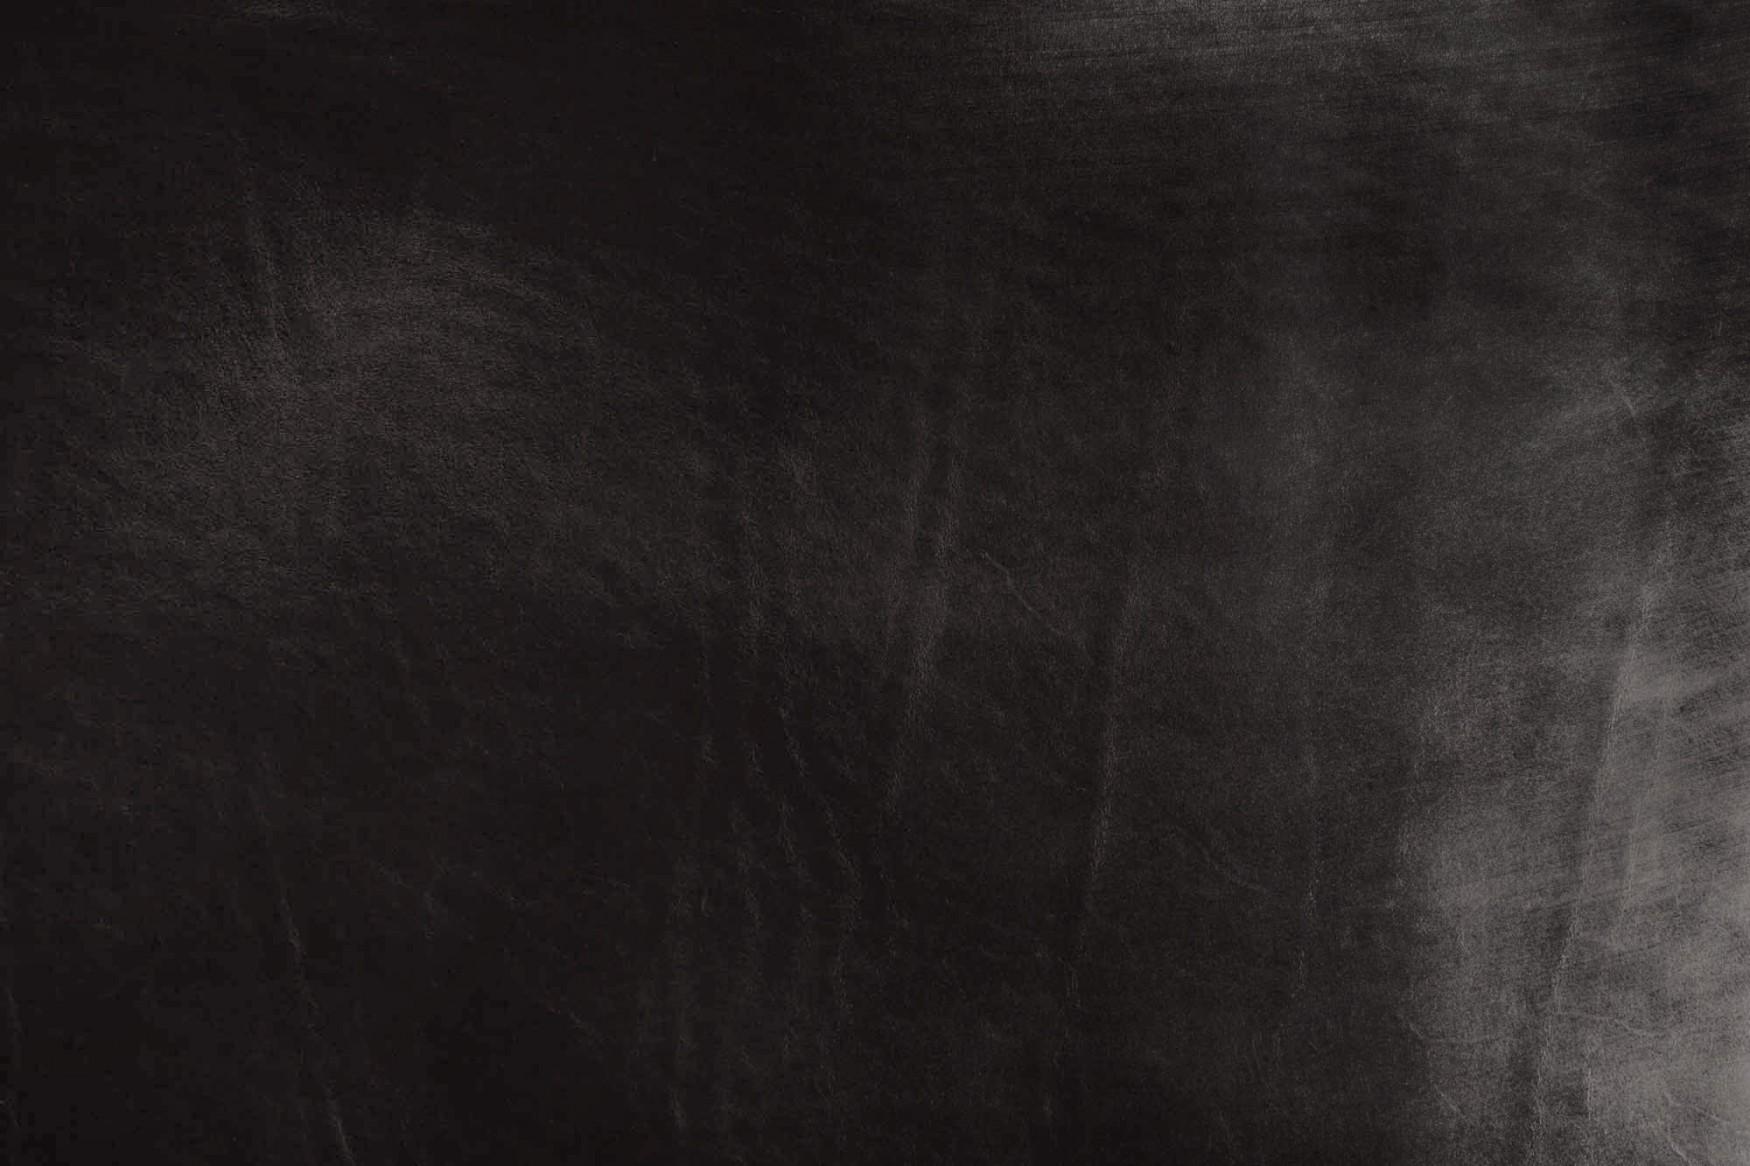 Element7_Leather_Floor_masons-black_1